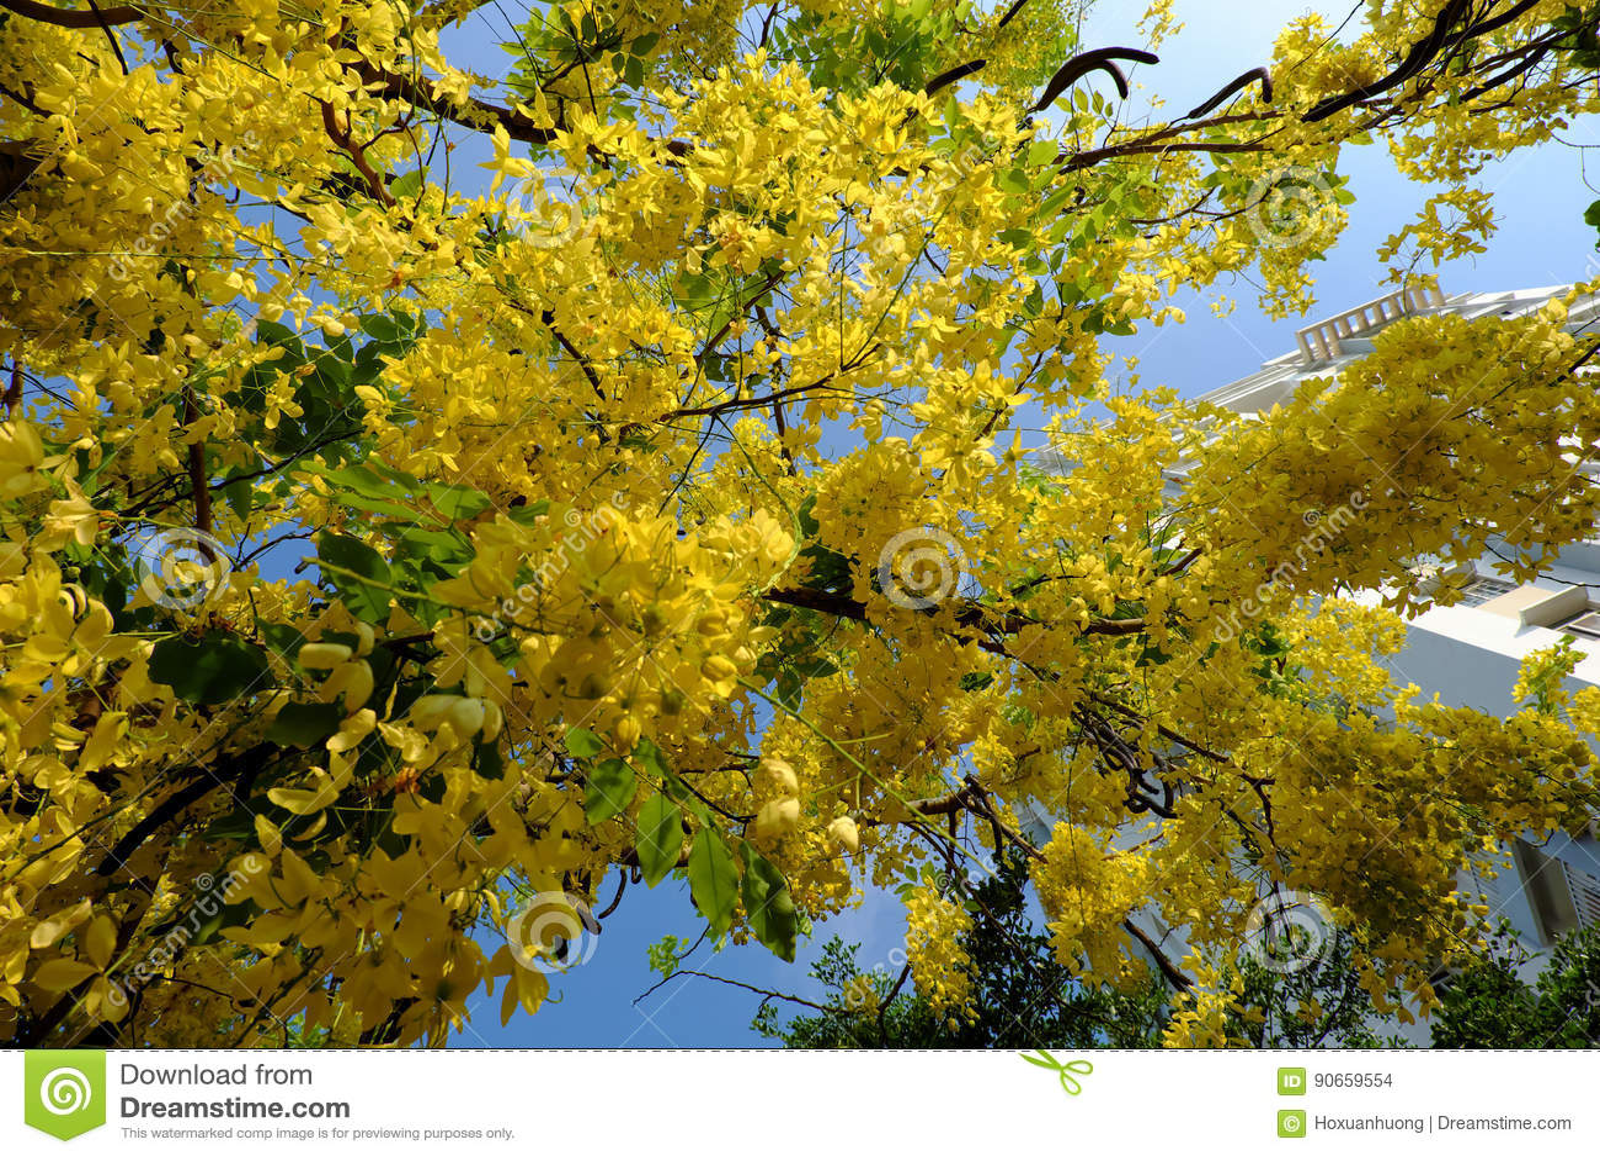 Cassia Fistula Tree Yellow Flower Stock Photo Image Of Floral